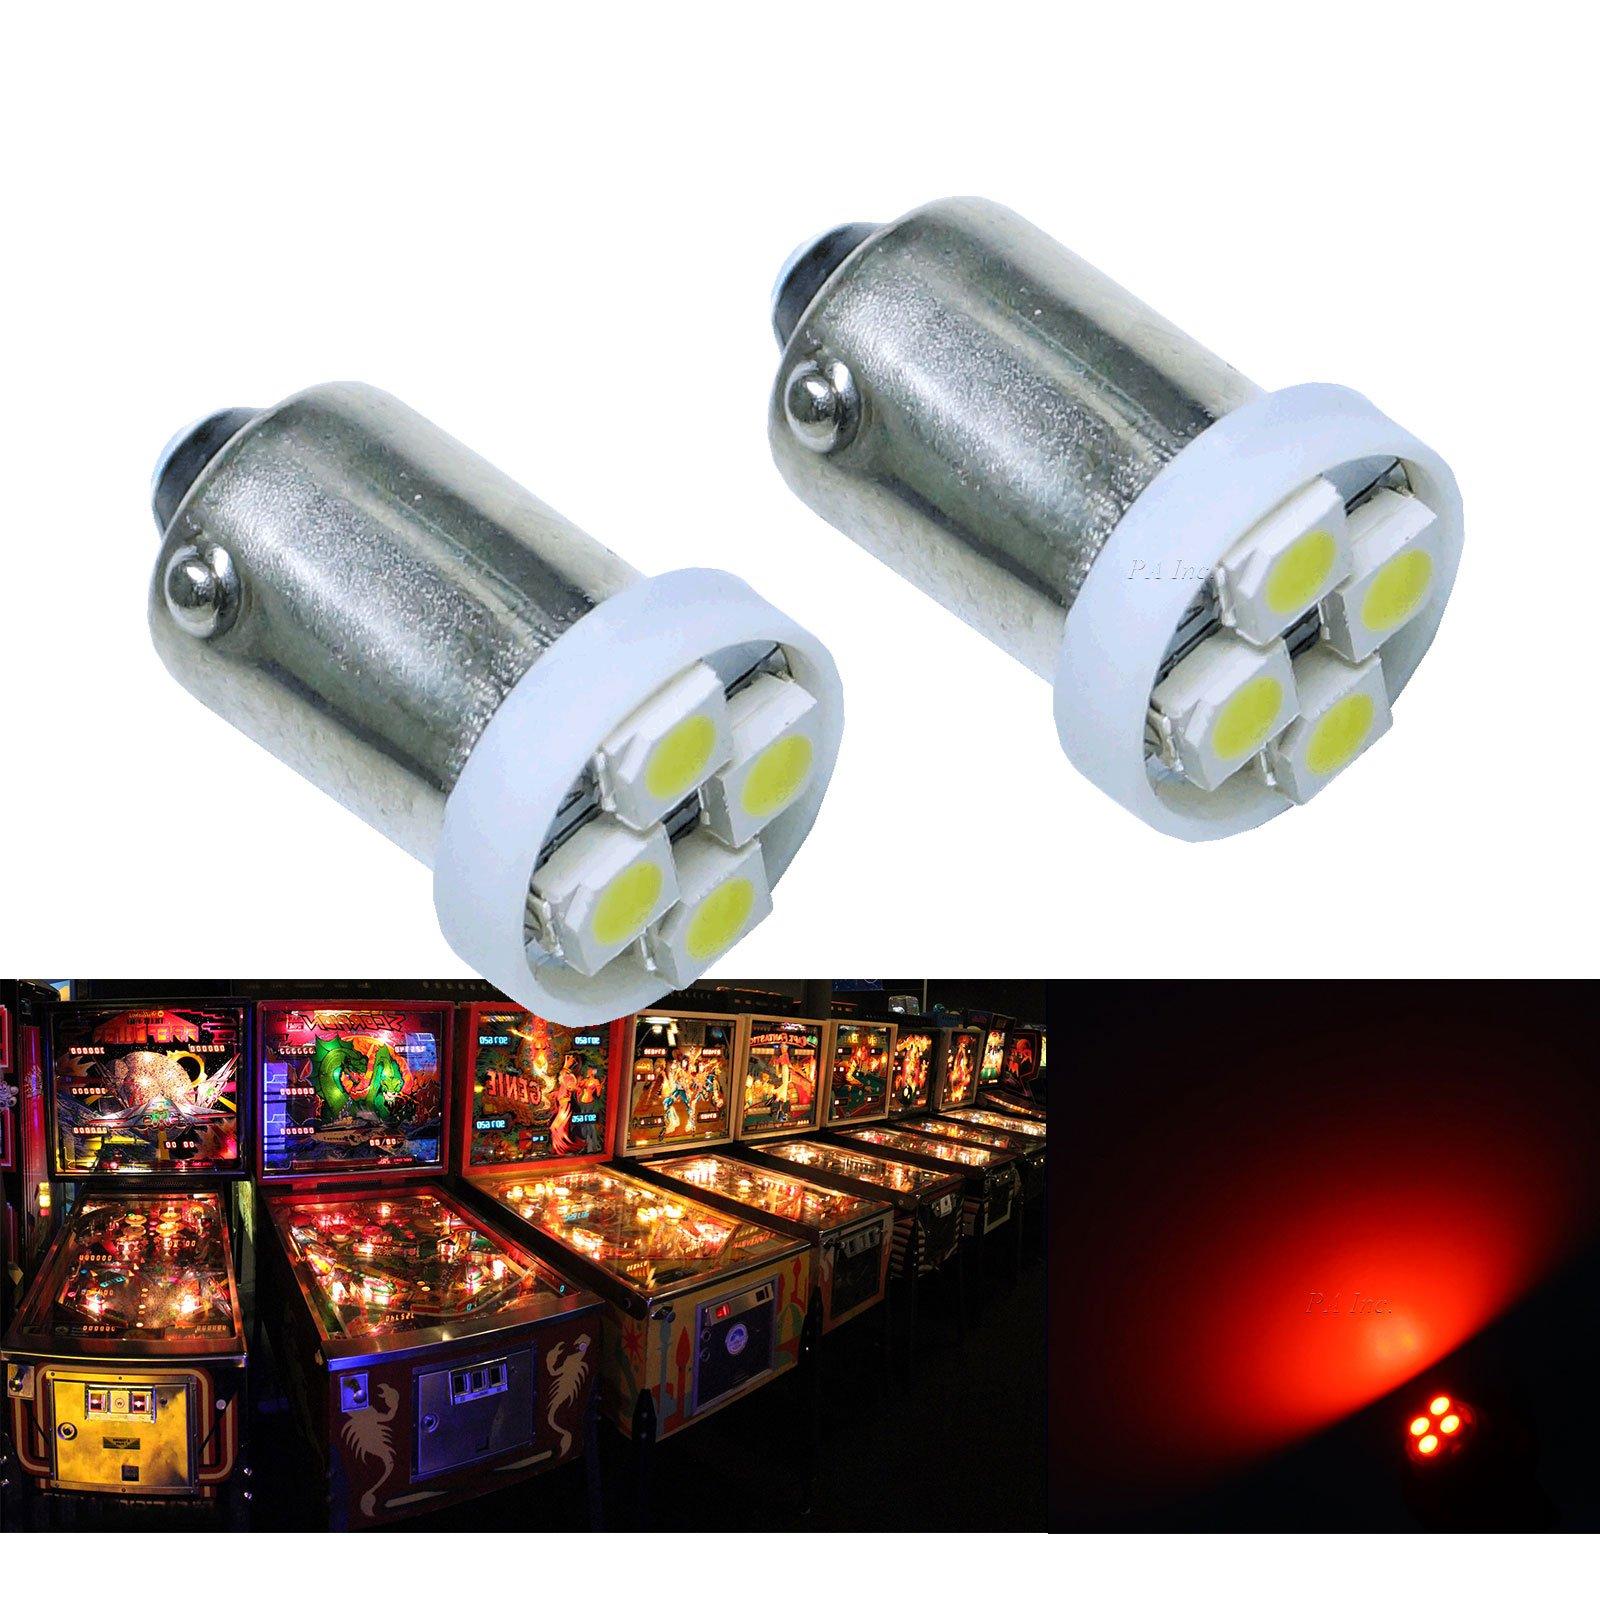 PA 10PCS #1893 #44 #47 #756 #1847 BA9S 4SMD LED Wedge Pinball Machine Light Bulb Red-6.3V by PA